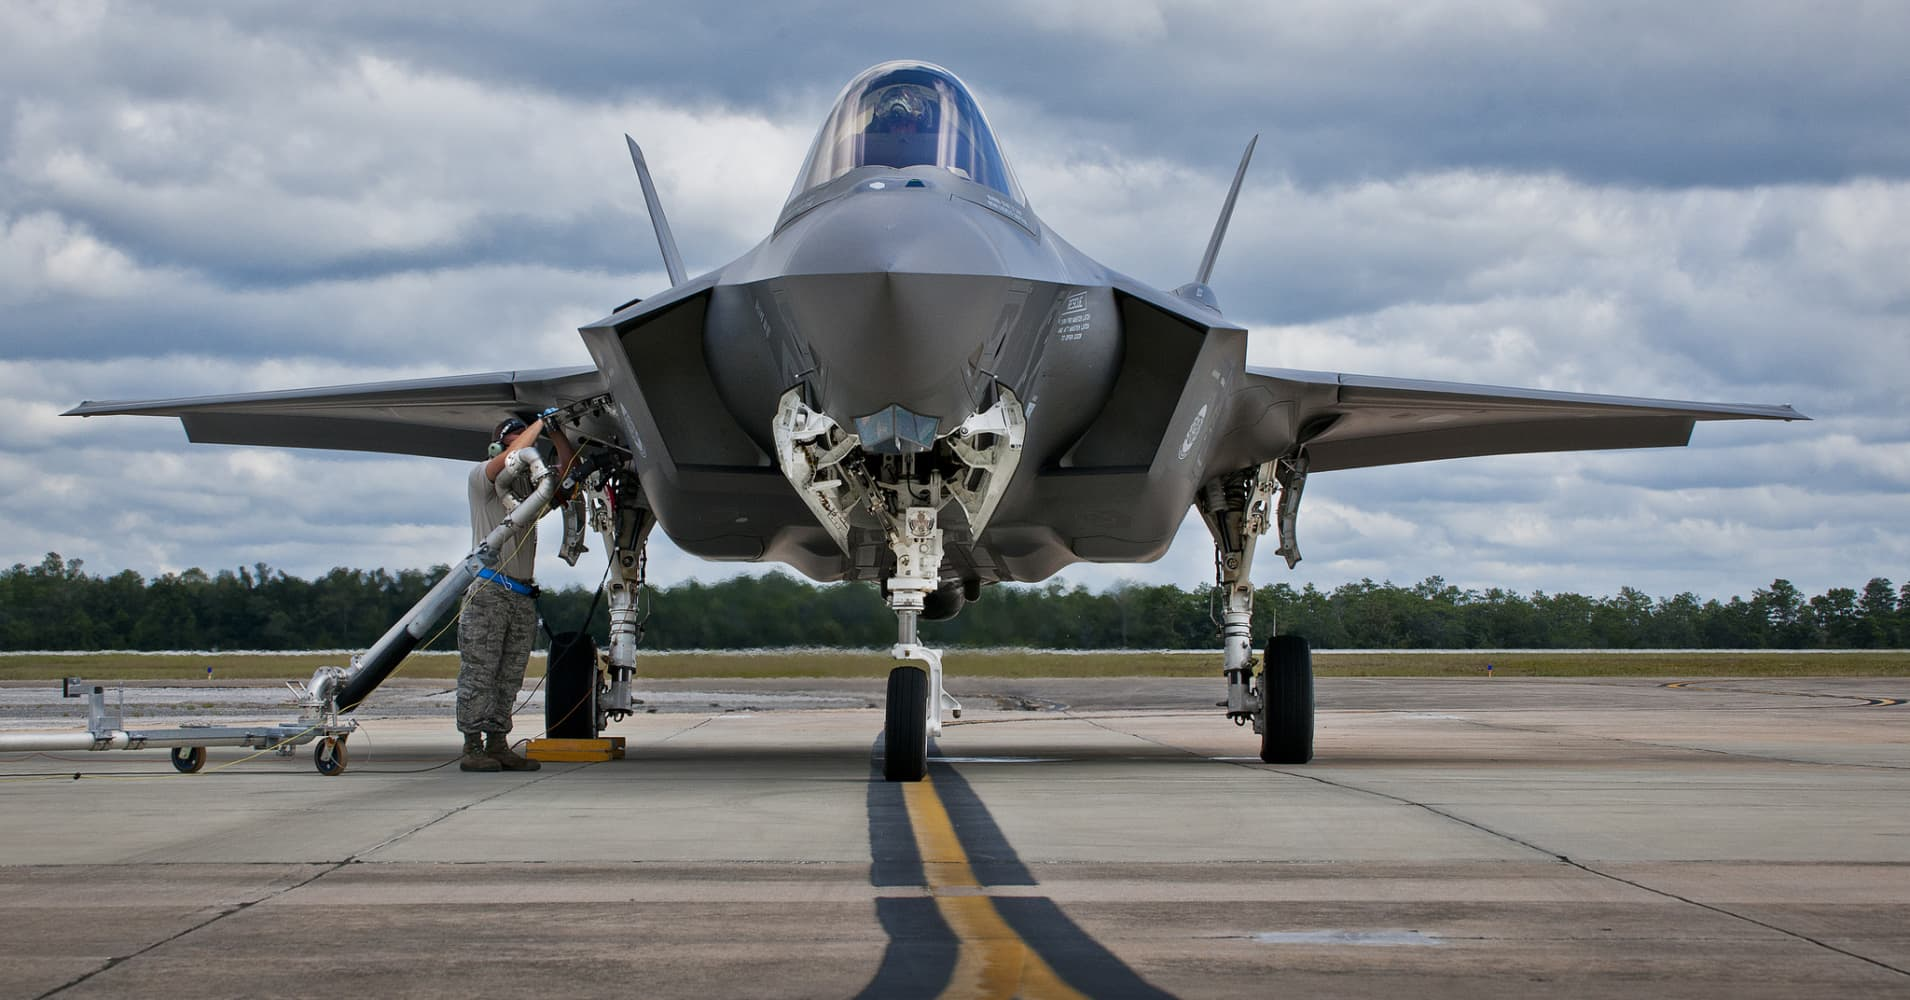 Pentagon grounds Lockheed Martin's F-35 jets after South Carolina crash